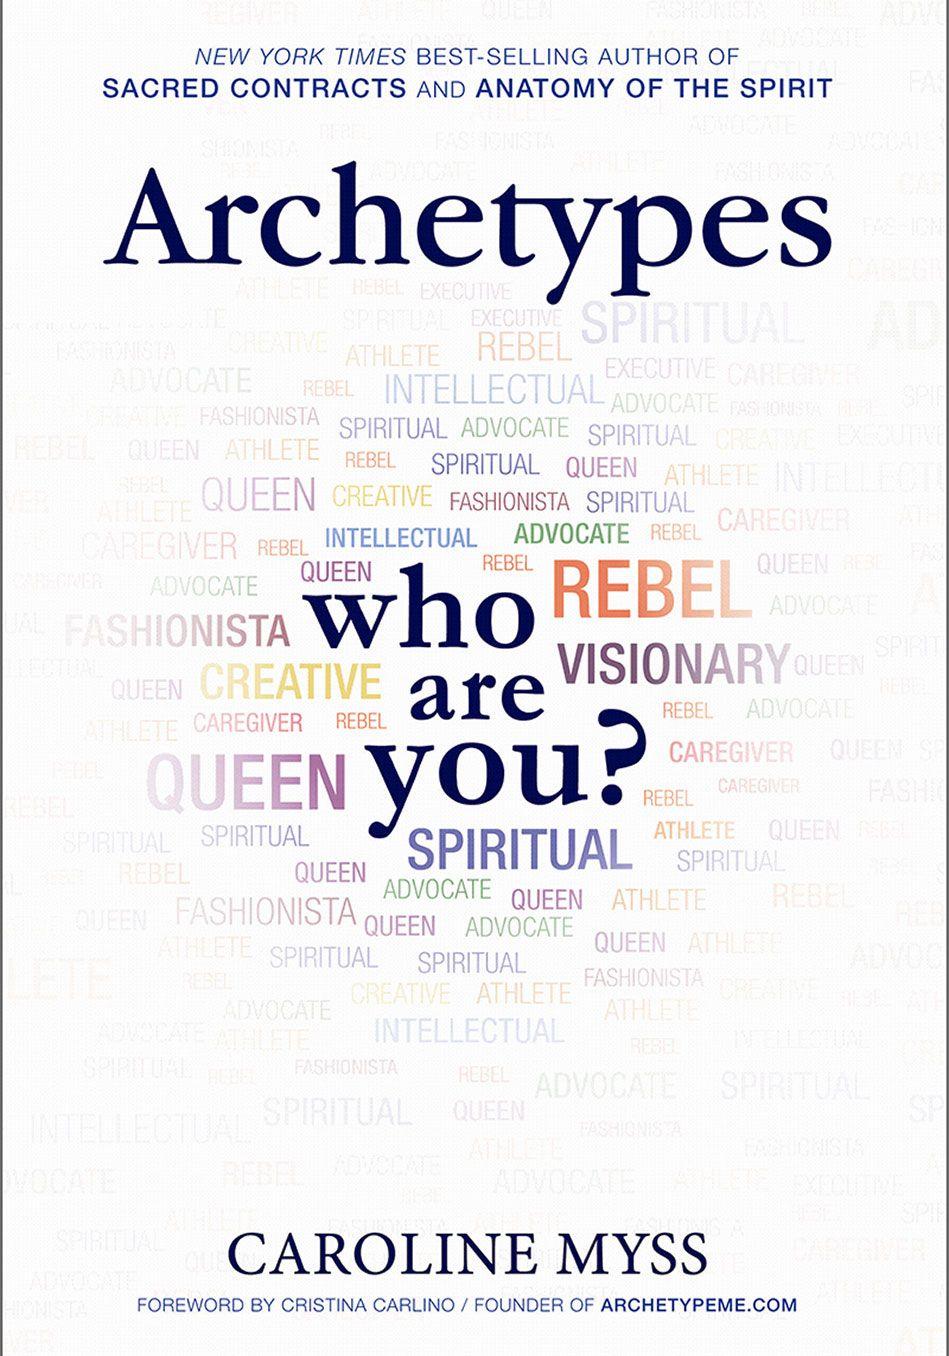 Book Excerpt: Archetypes by Caroline Myss | Books, Book nerd and Authors